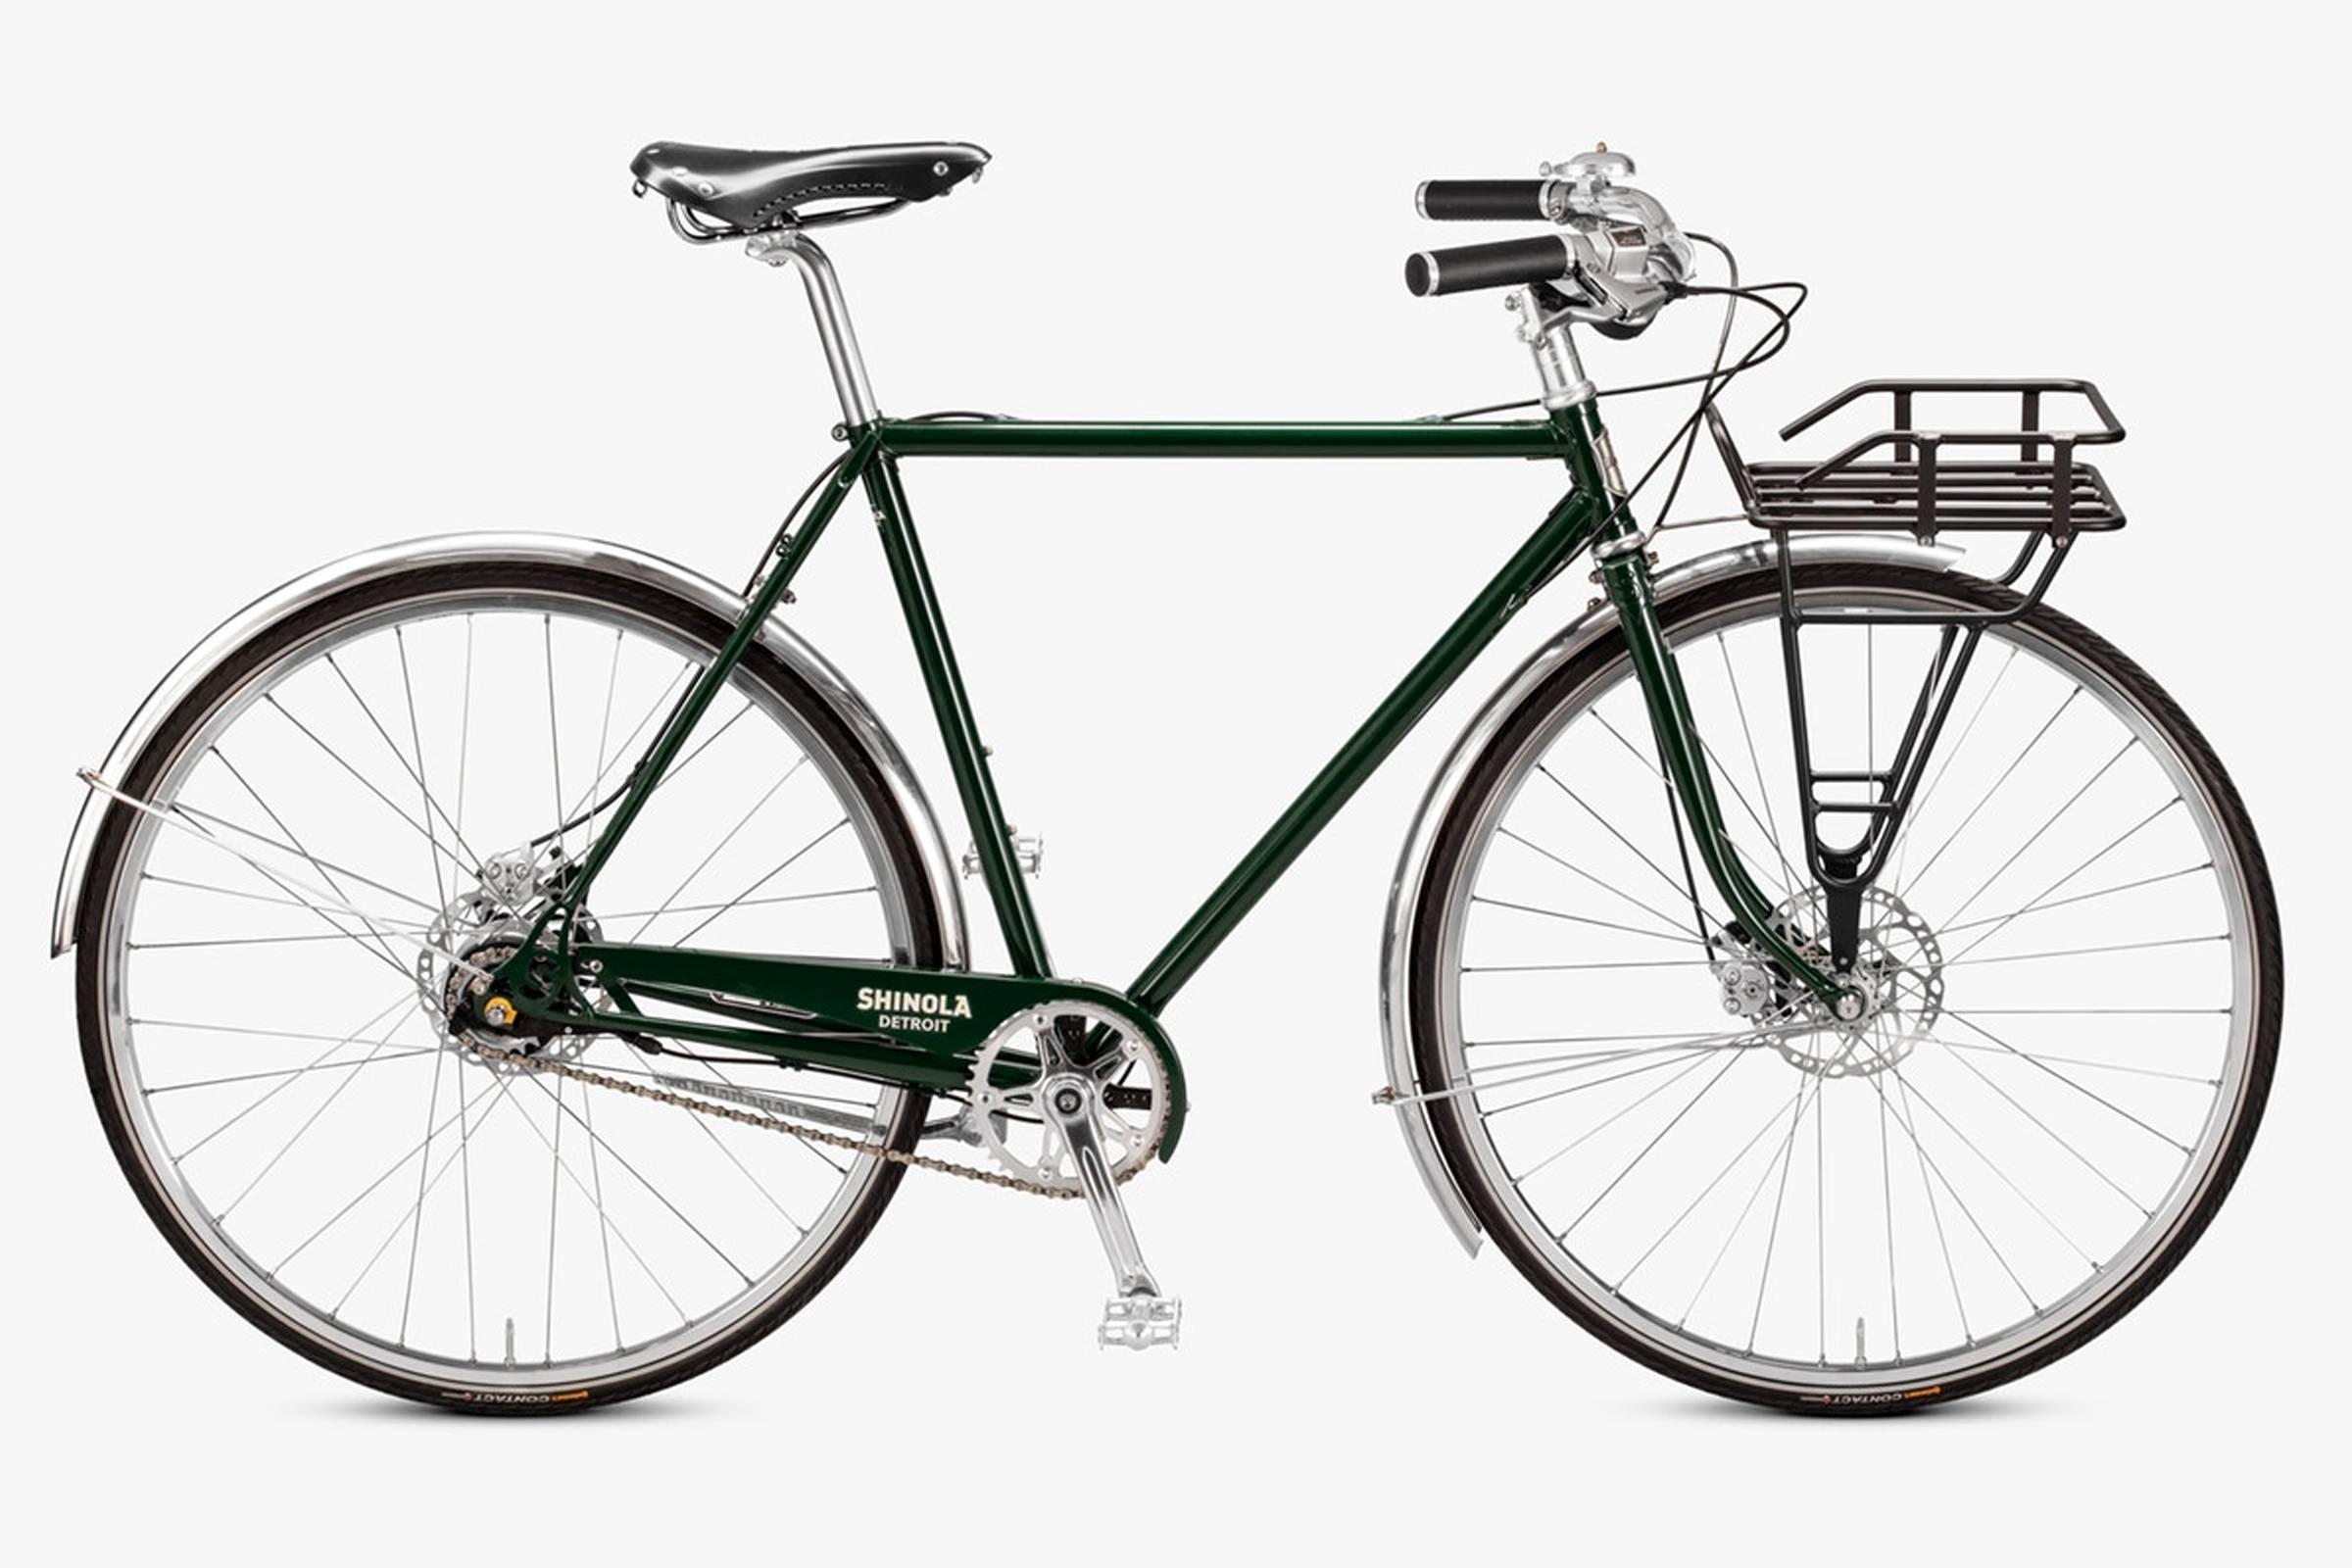 The Shinola Runwell Bicycle